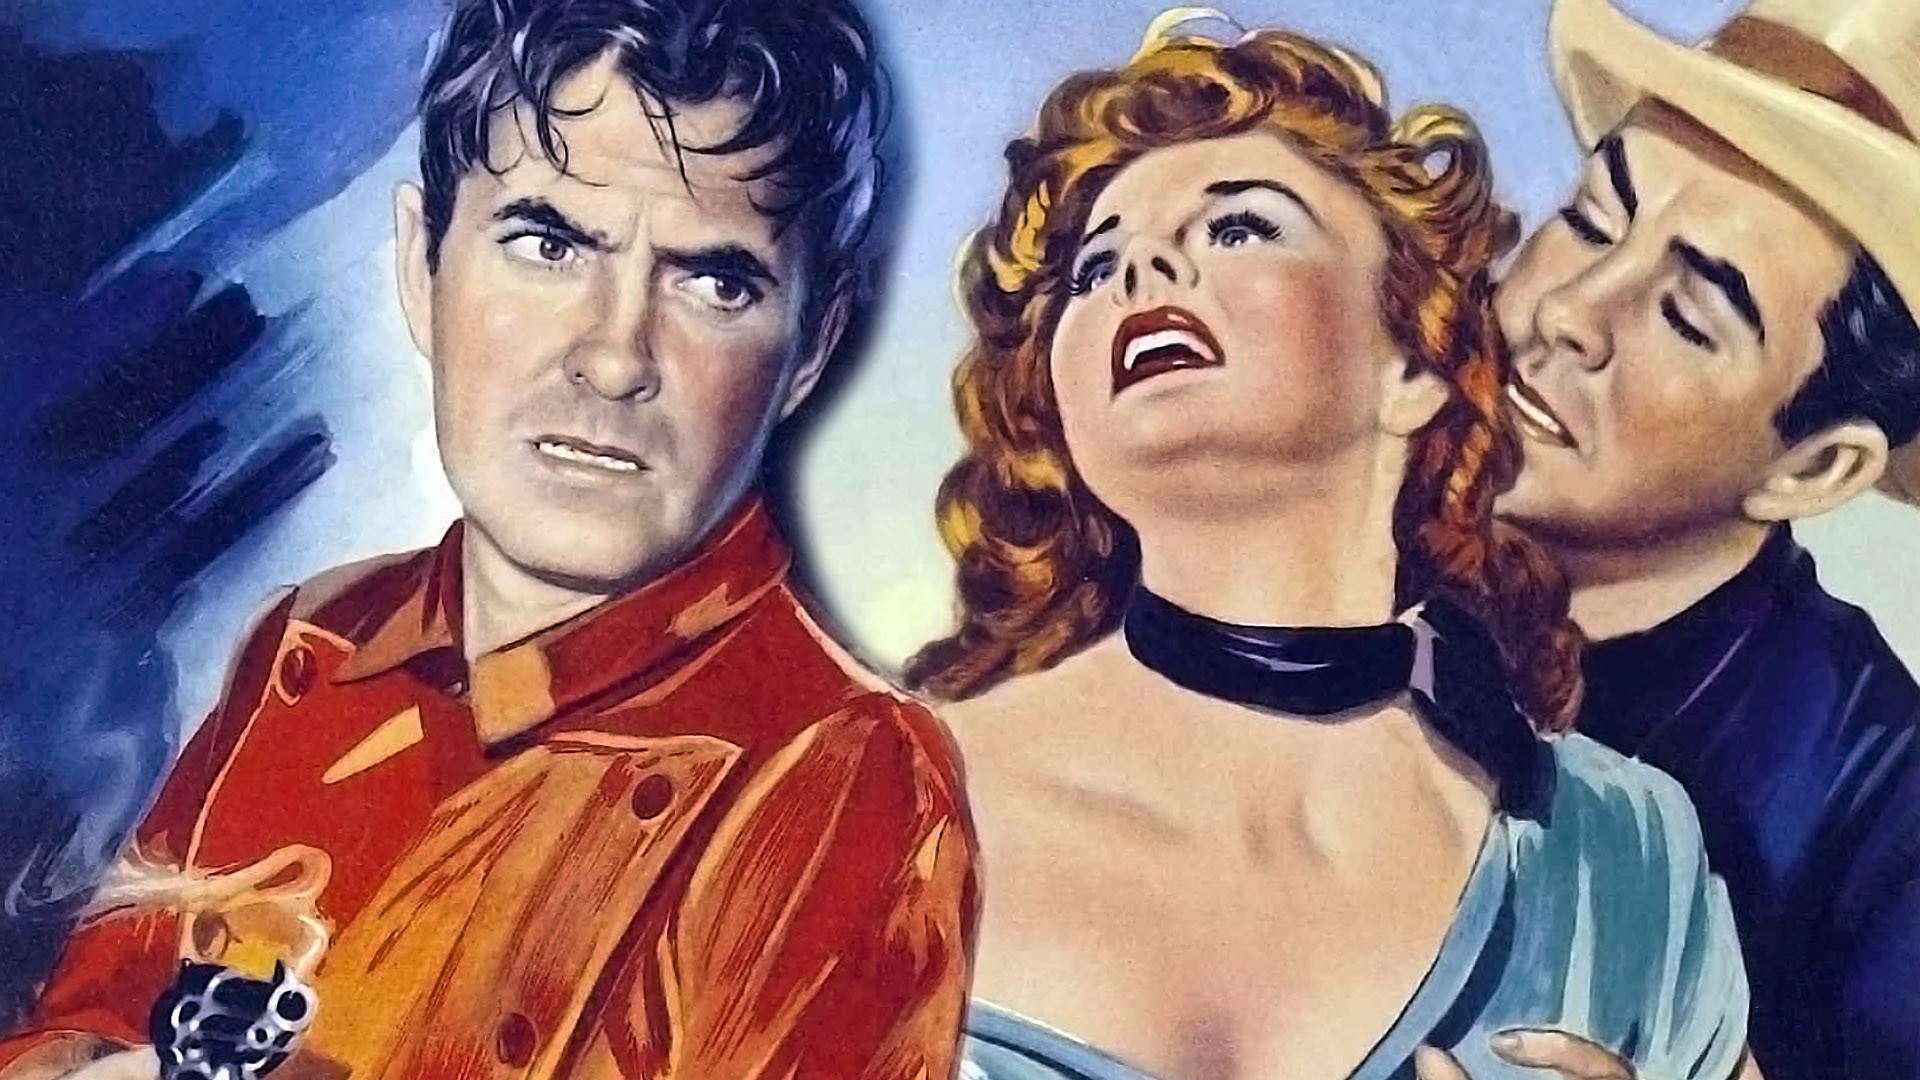 Rawhide movie 1950